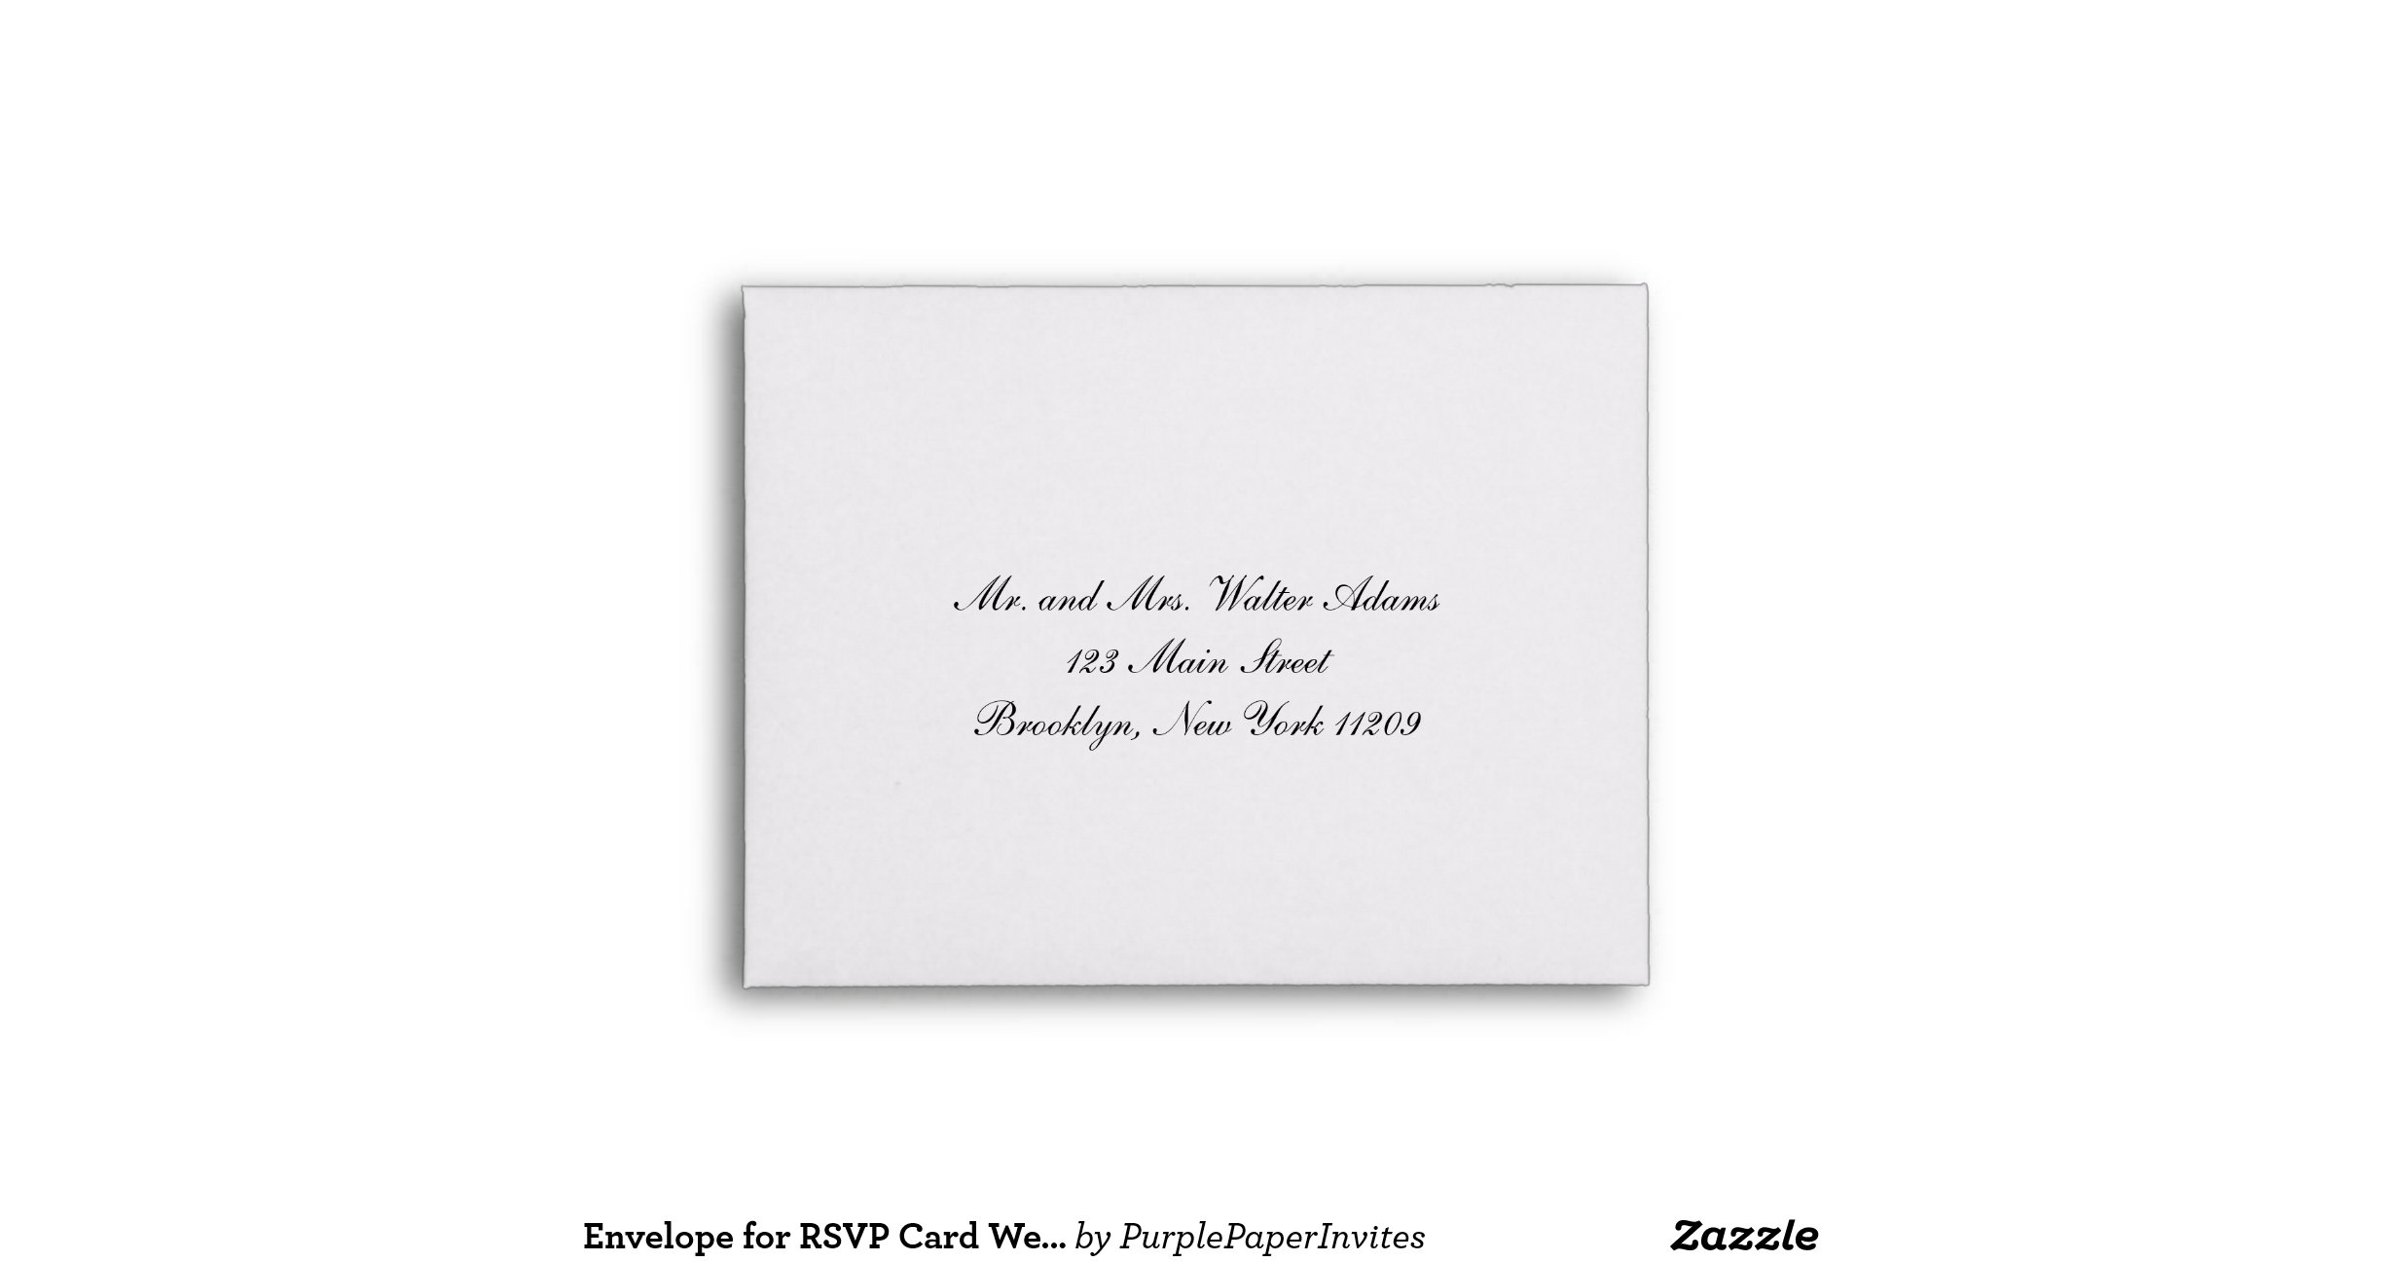 envelope for rsvp card wedding invitation With wedding invitations rsvp card in envelope